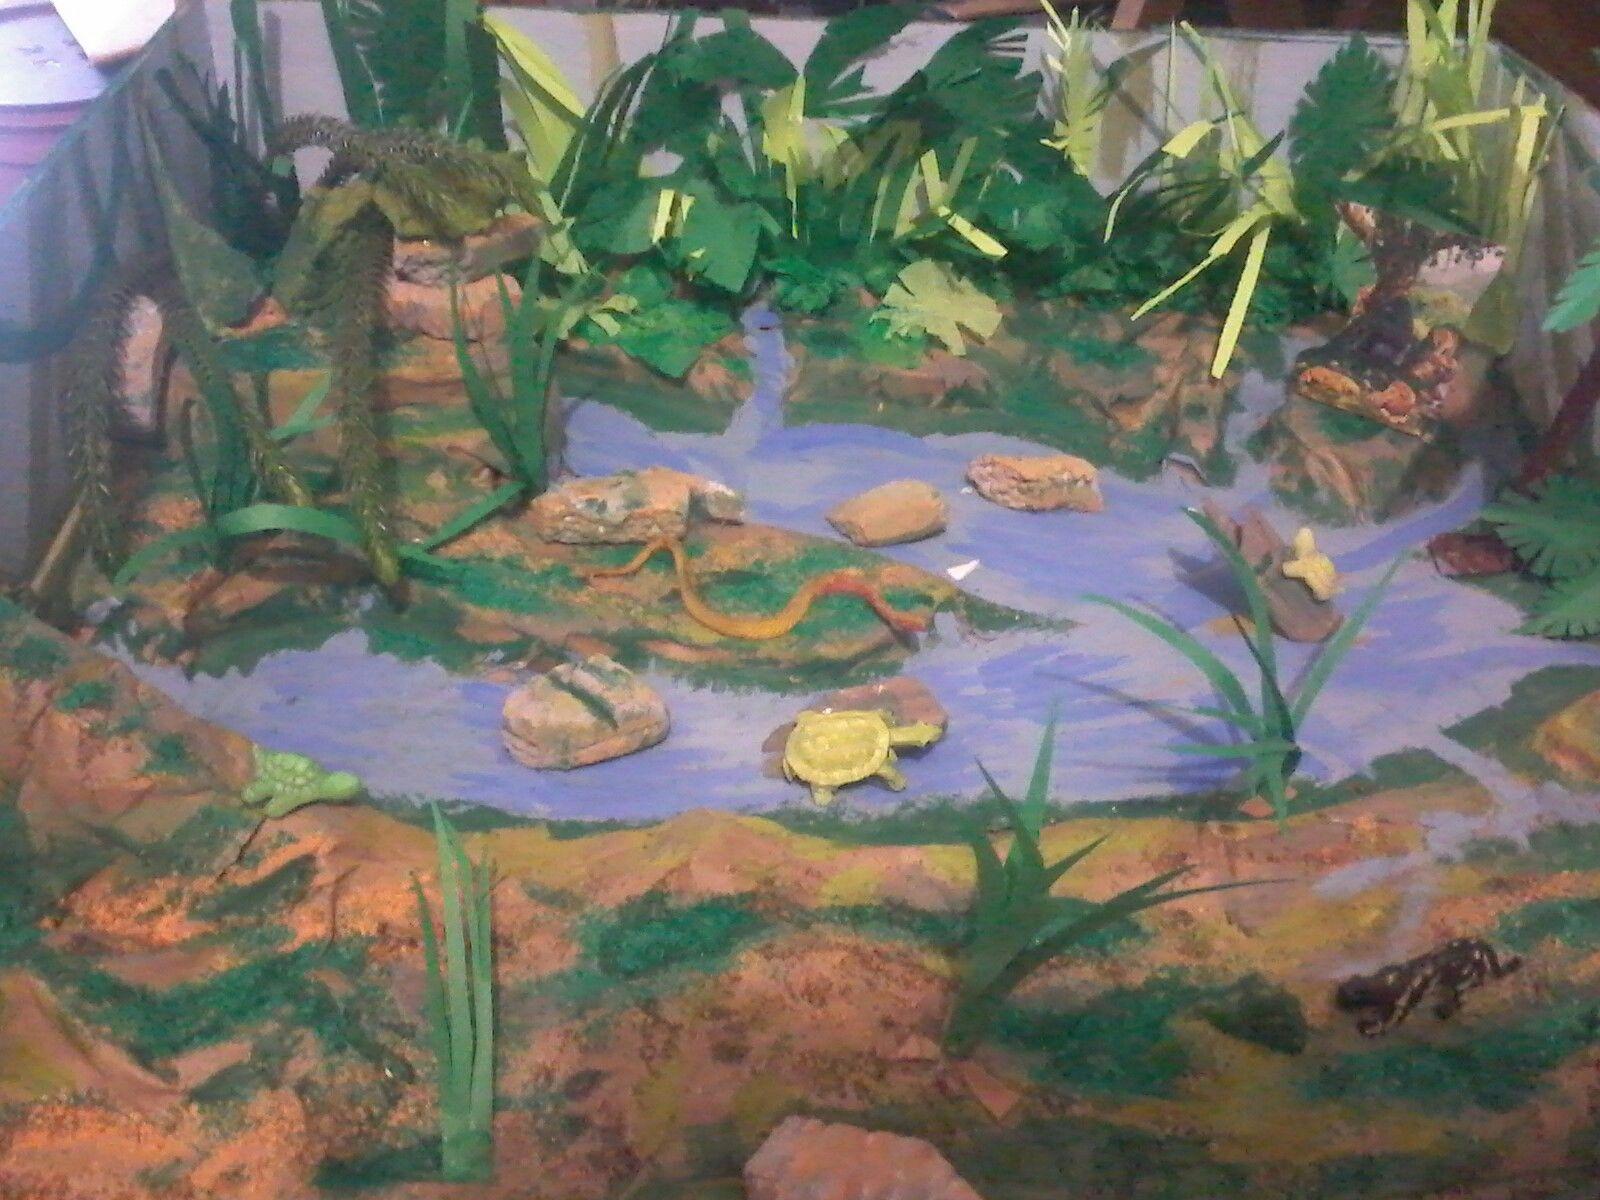 Maqueta Selva Humeda Paraisos En La Tierra Selva Humeda